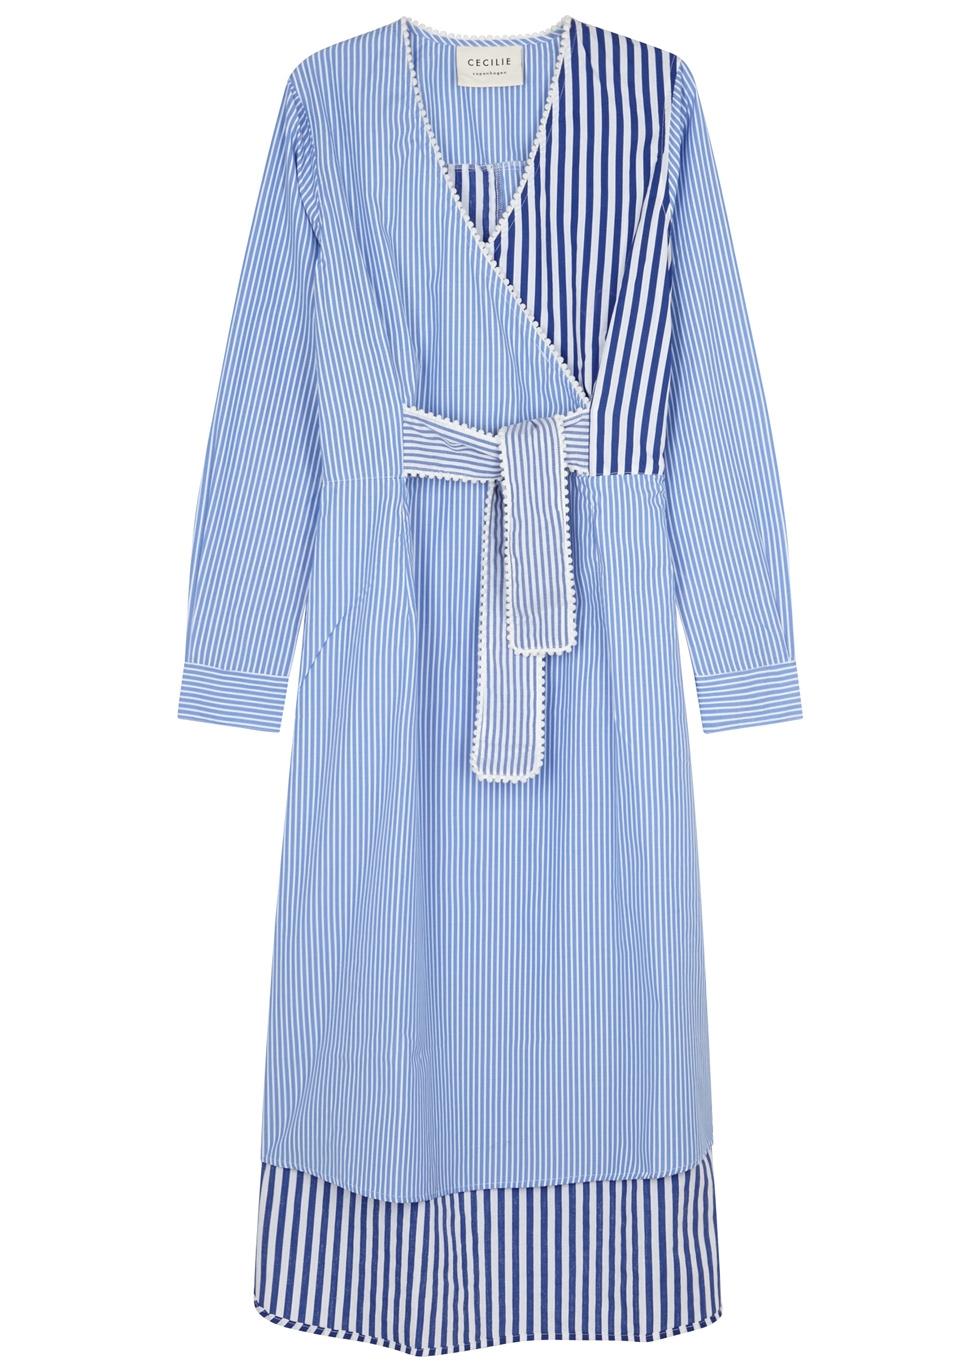 CECILIE COPENHAGEN ROLLERCONE STRIPED COTTON SHIRT DRESS